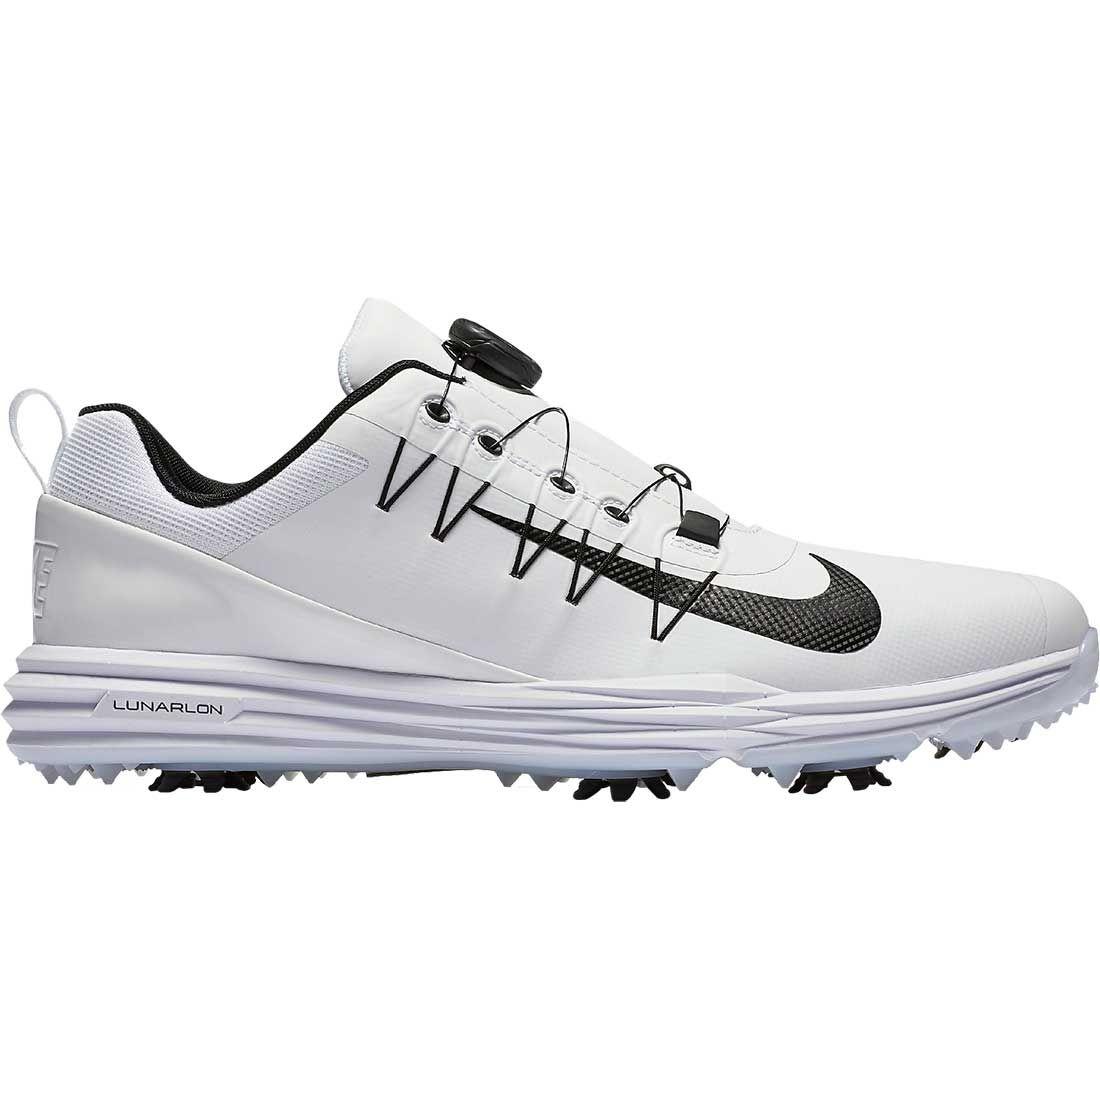 nike men's lunar command 2 boa golf shoes